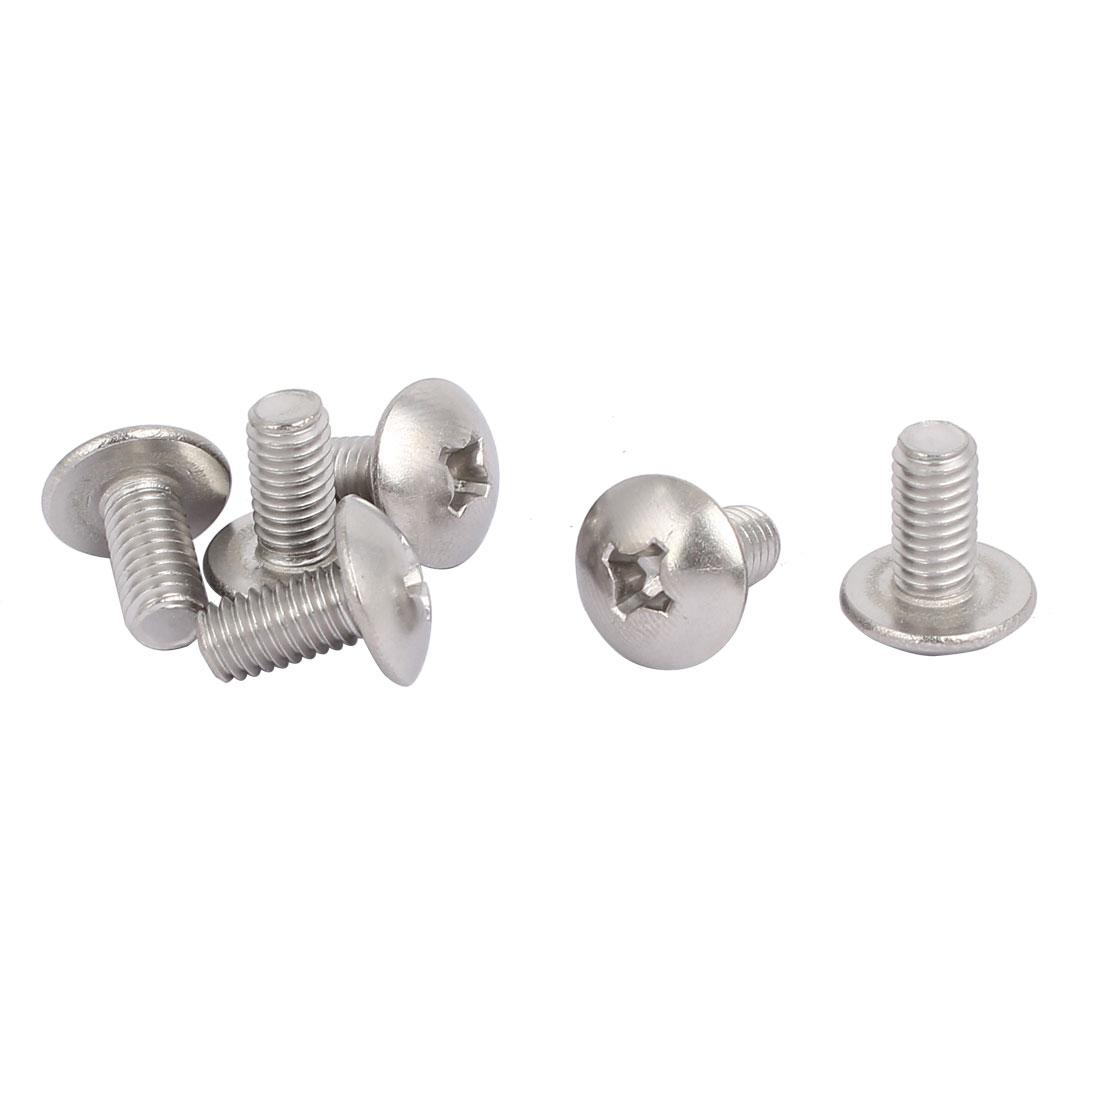 M6 x 12mm 316 Stainless Steel Truss Phillips Head Machine Screws 6pcs